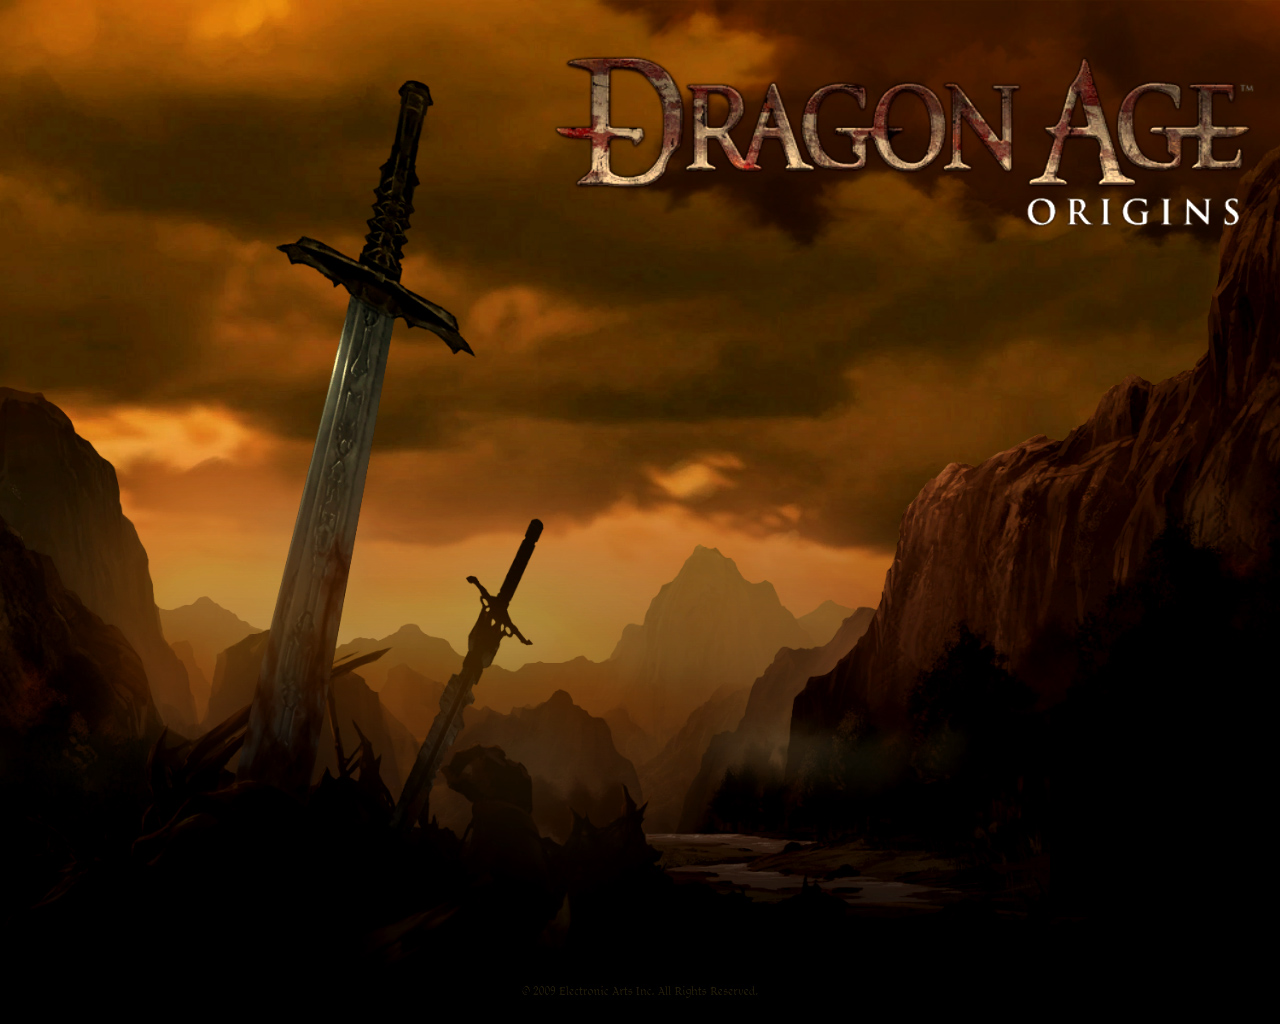 http://2.bp.blogspot.com/-x0ktHTdMhmE/UDQTCWML9II/AAAAAAAACr8/FfVVf6Nrx94/s1600/dragon-age-origins-wallpaper-13.jpg